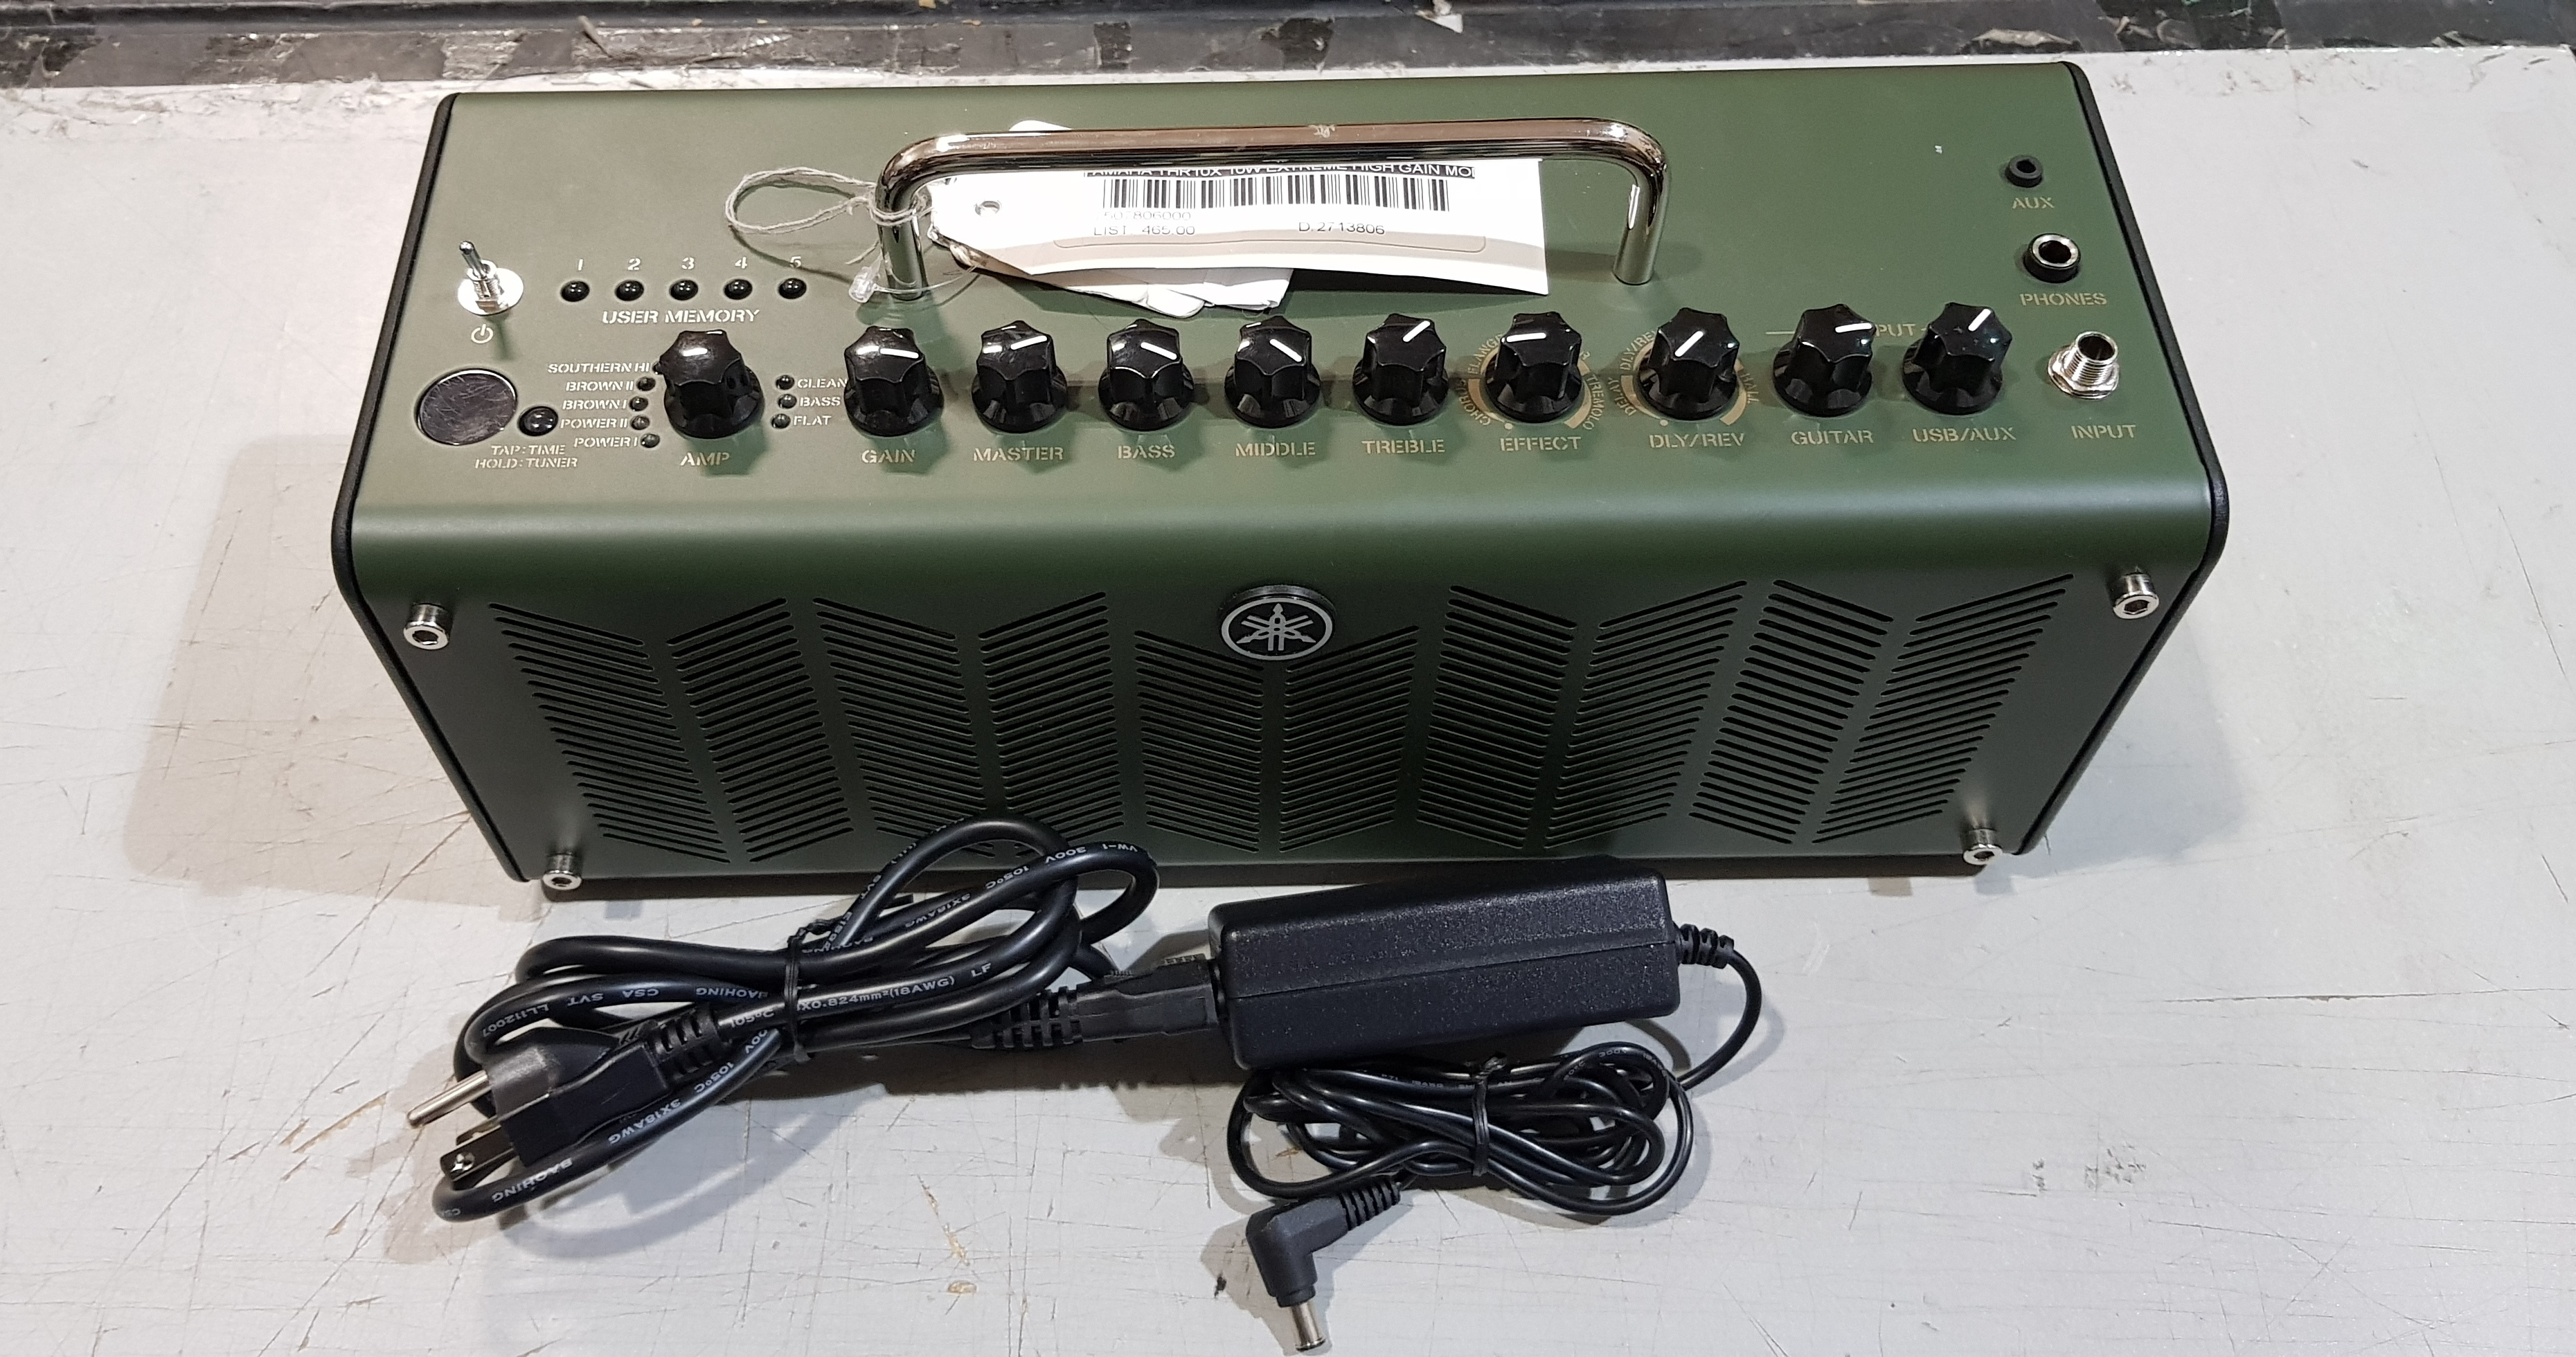 YAMAHA THR10X 10-watt Hi-Gain Modeling Combo Amp w/ Power Supply